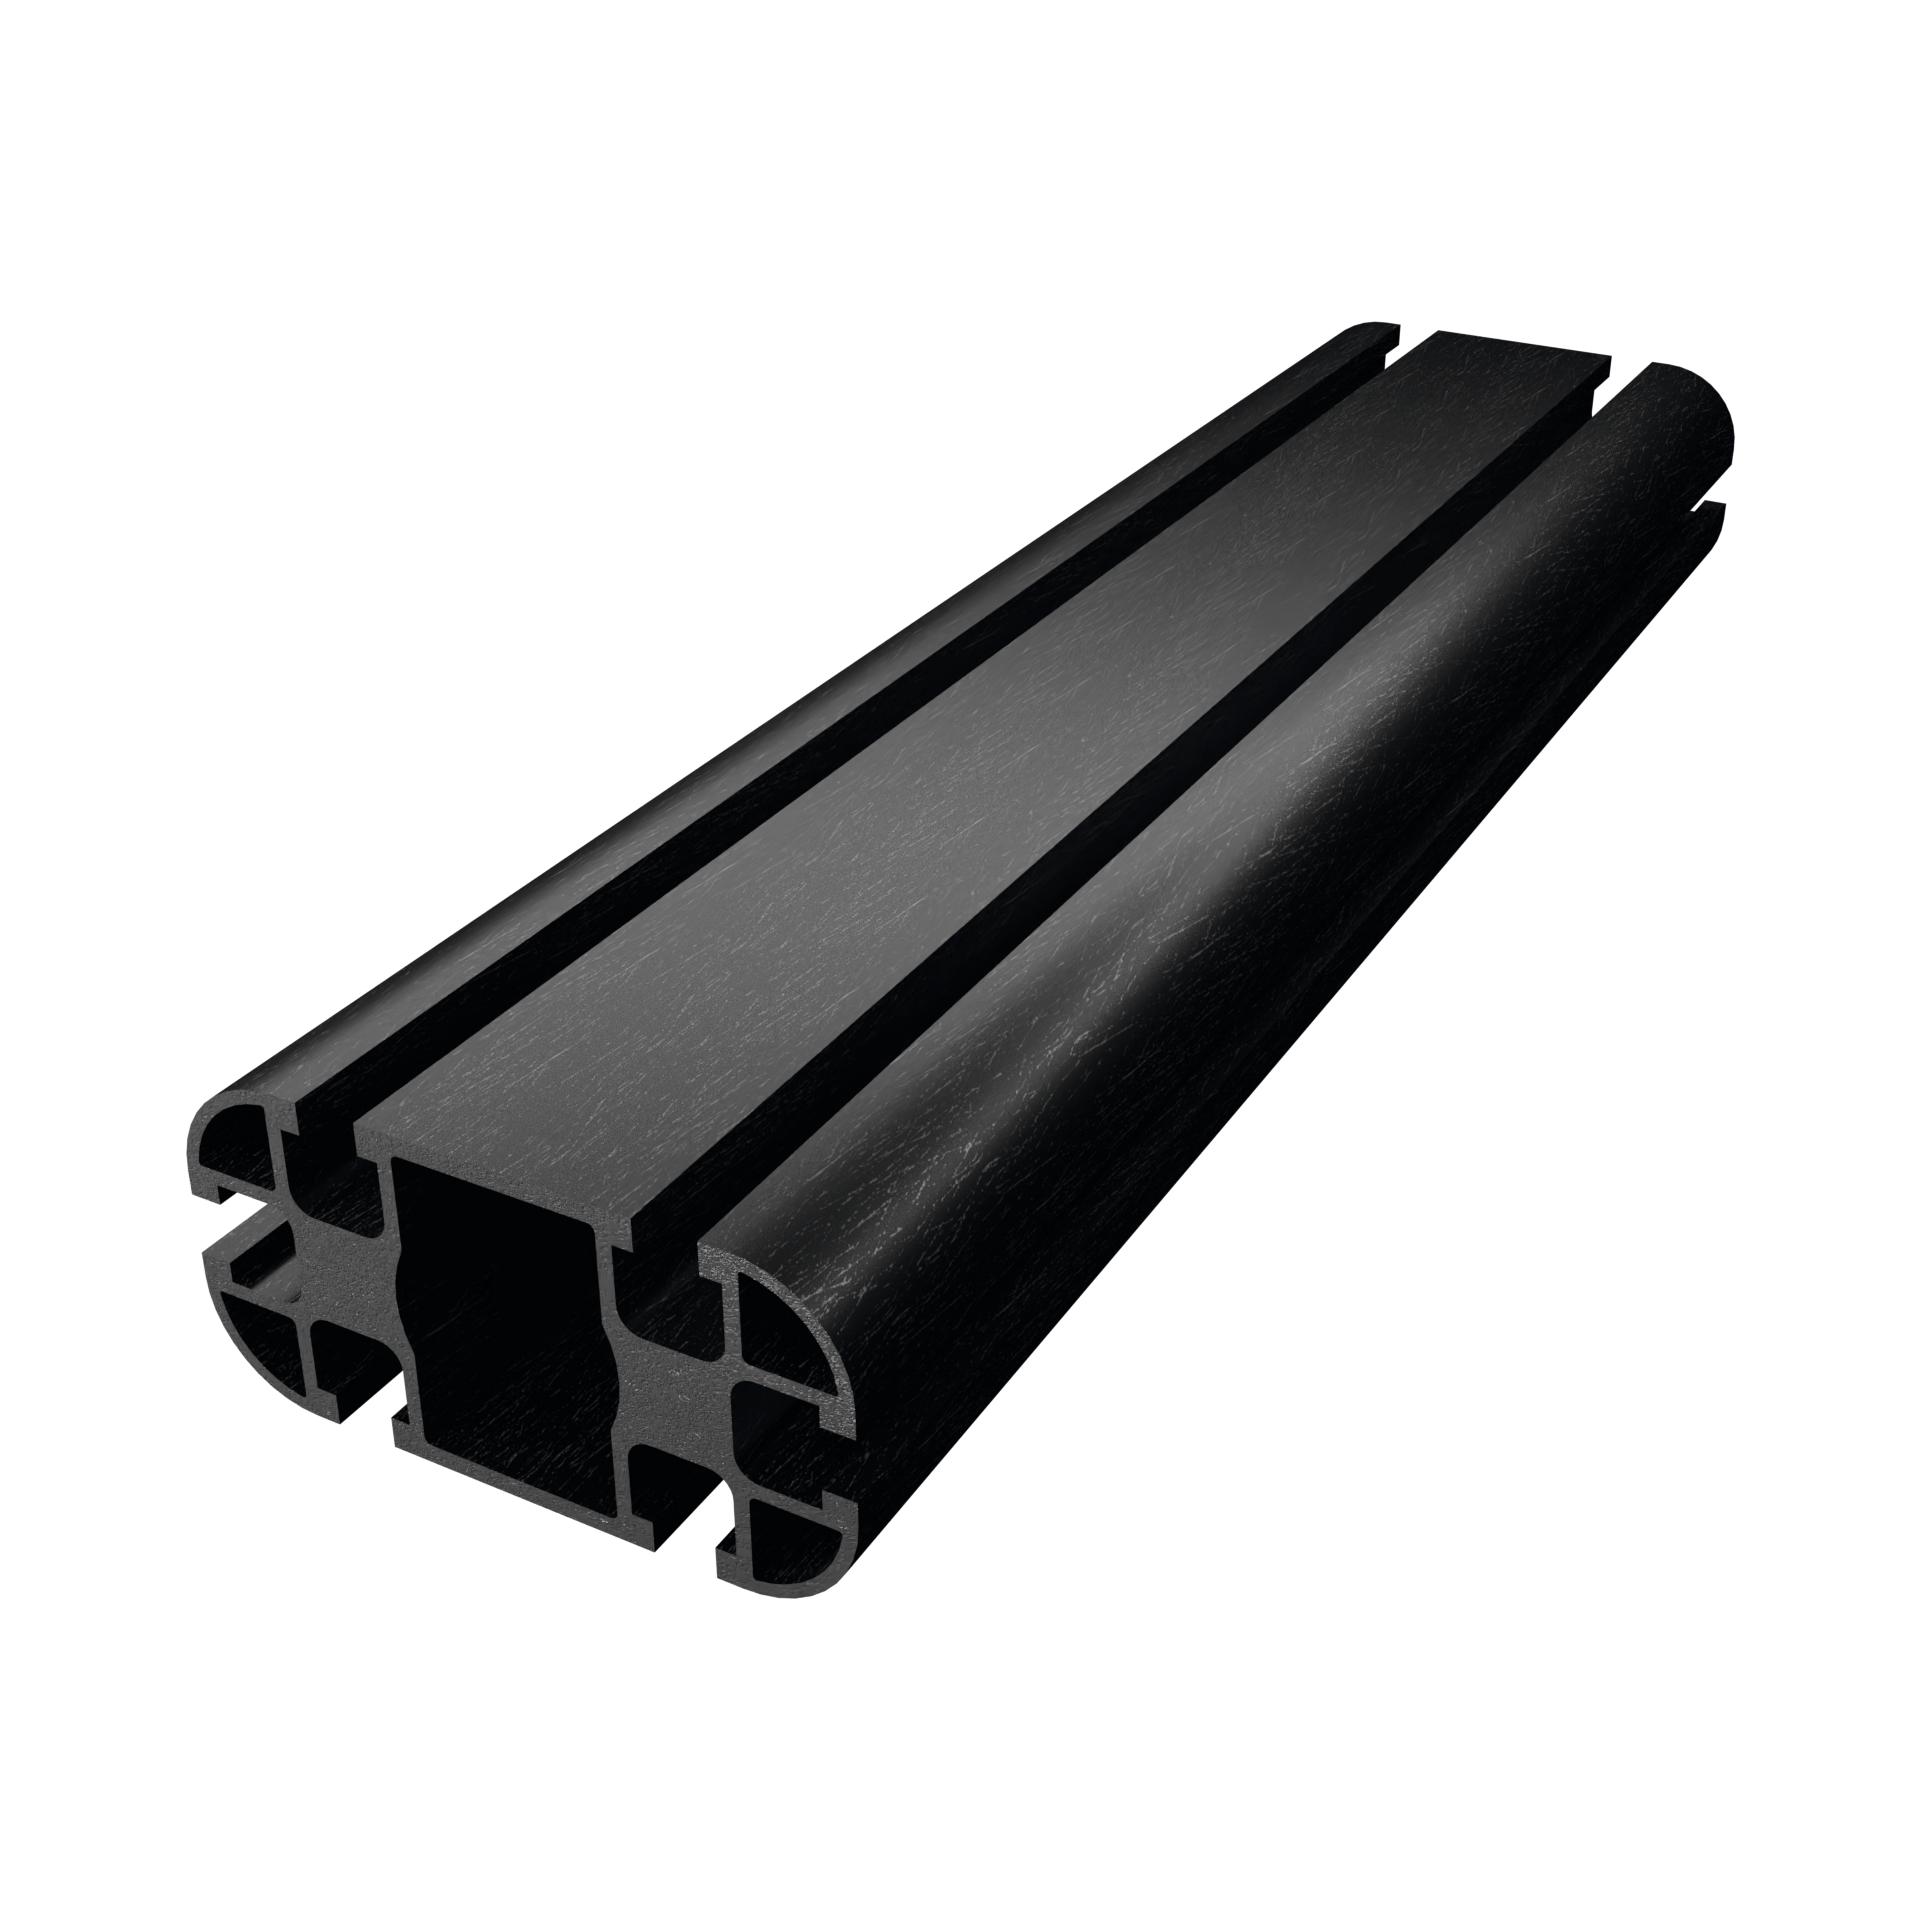 CarboSix Profilo in fibra di carbonio 45x90